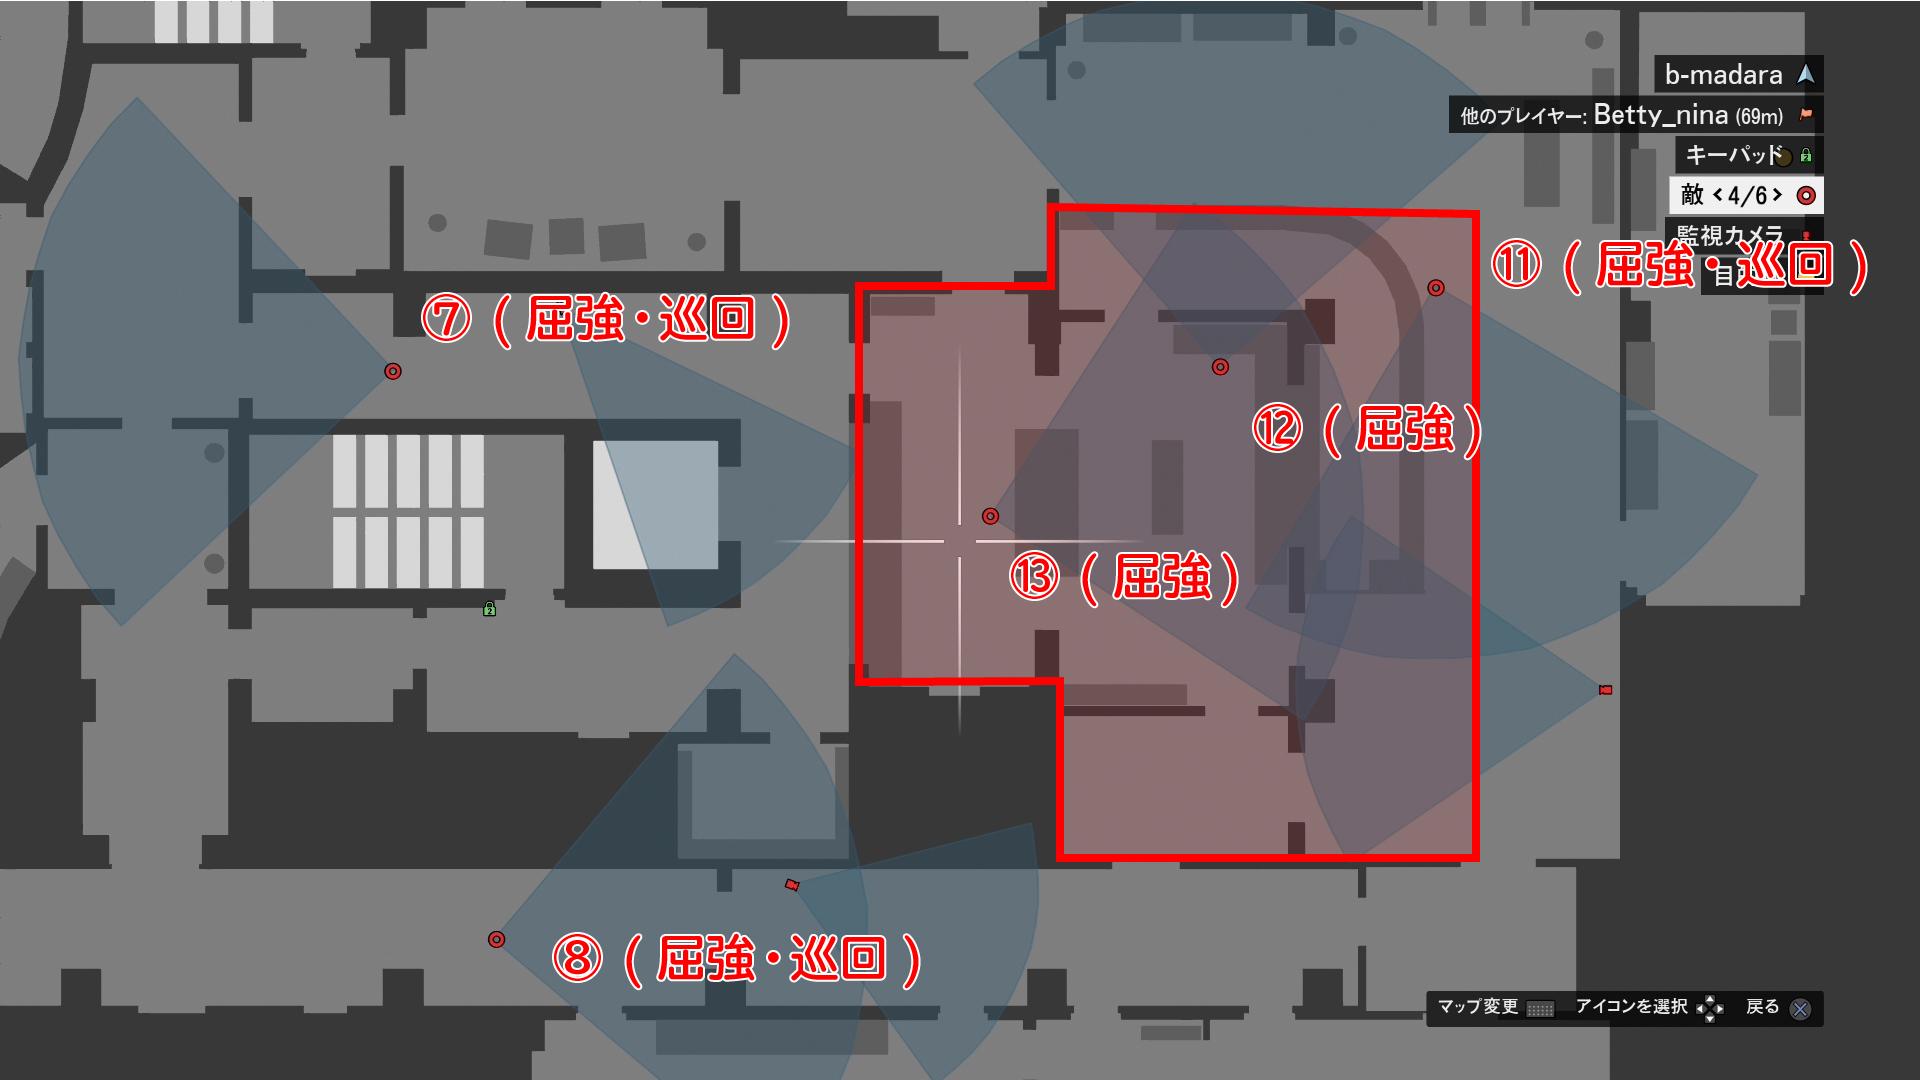 GTA5 カジノ強盗 『隠密行動(脱出編)』1Fスタッフロビーの配置